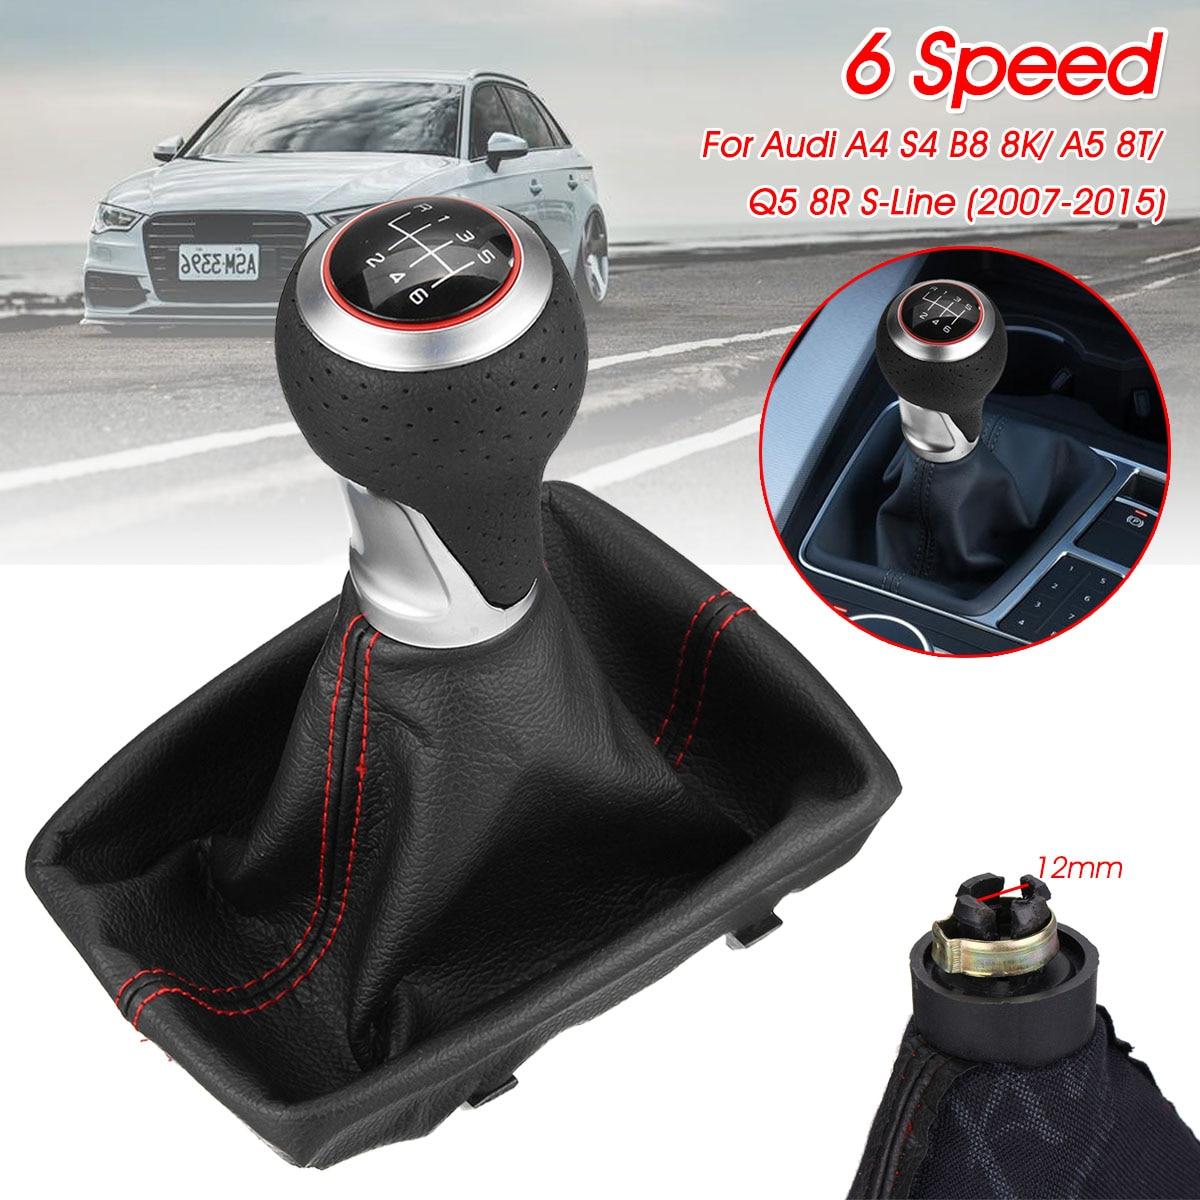 6 Speed Manual Car Gear Shift Shifter Knob For Audi A4 S4 B8 8K A5 8T Q5 S-Line